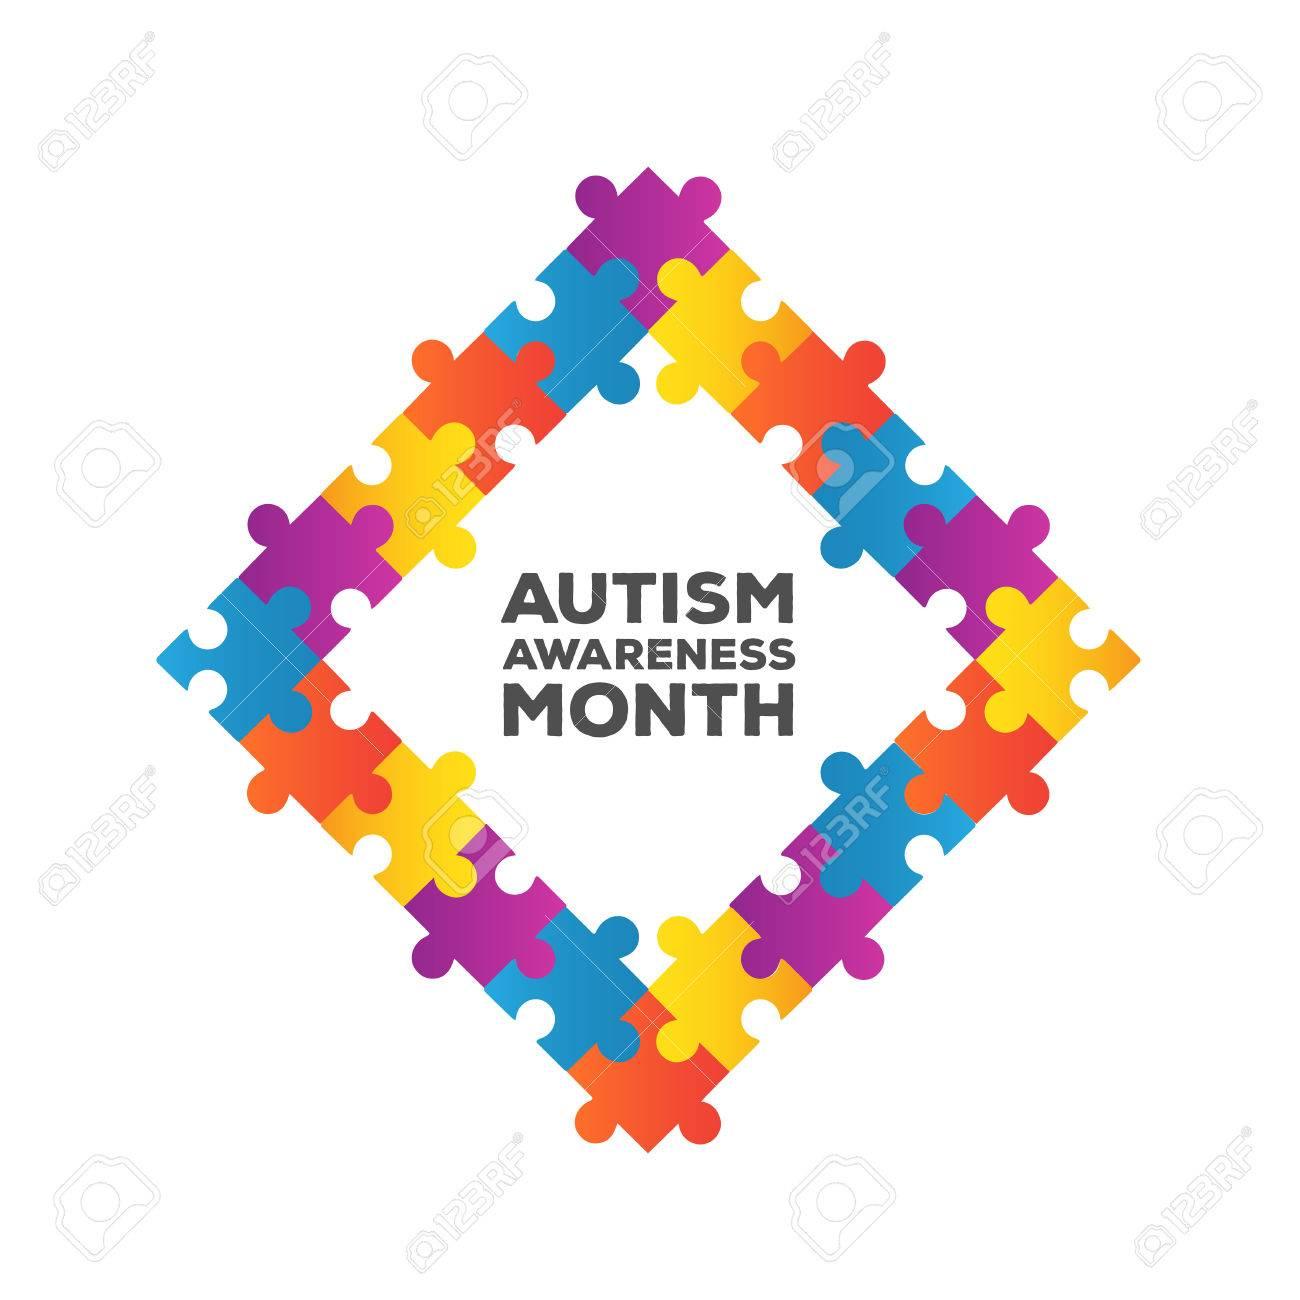 Digitally generated Autism awareness design vector Stock Vector - 38096416